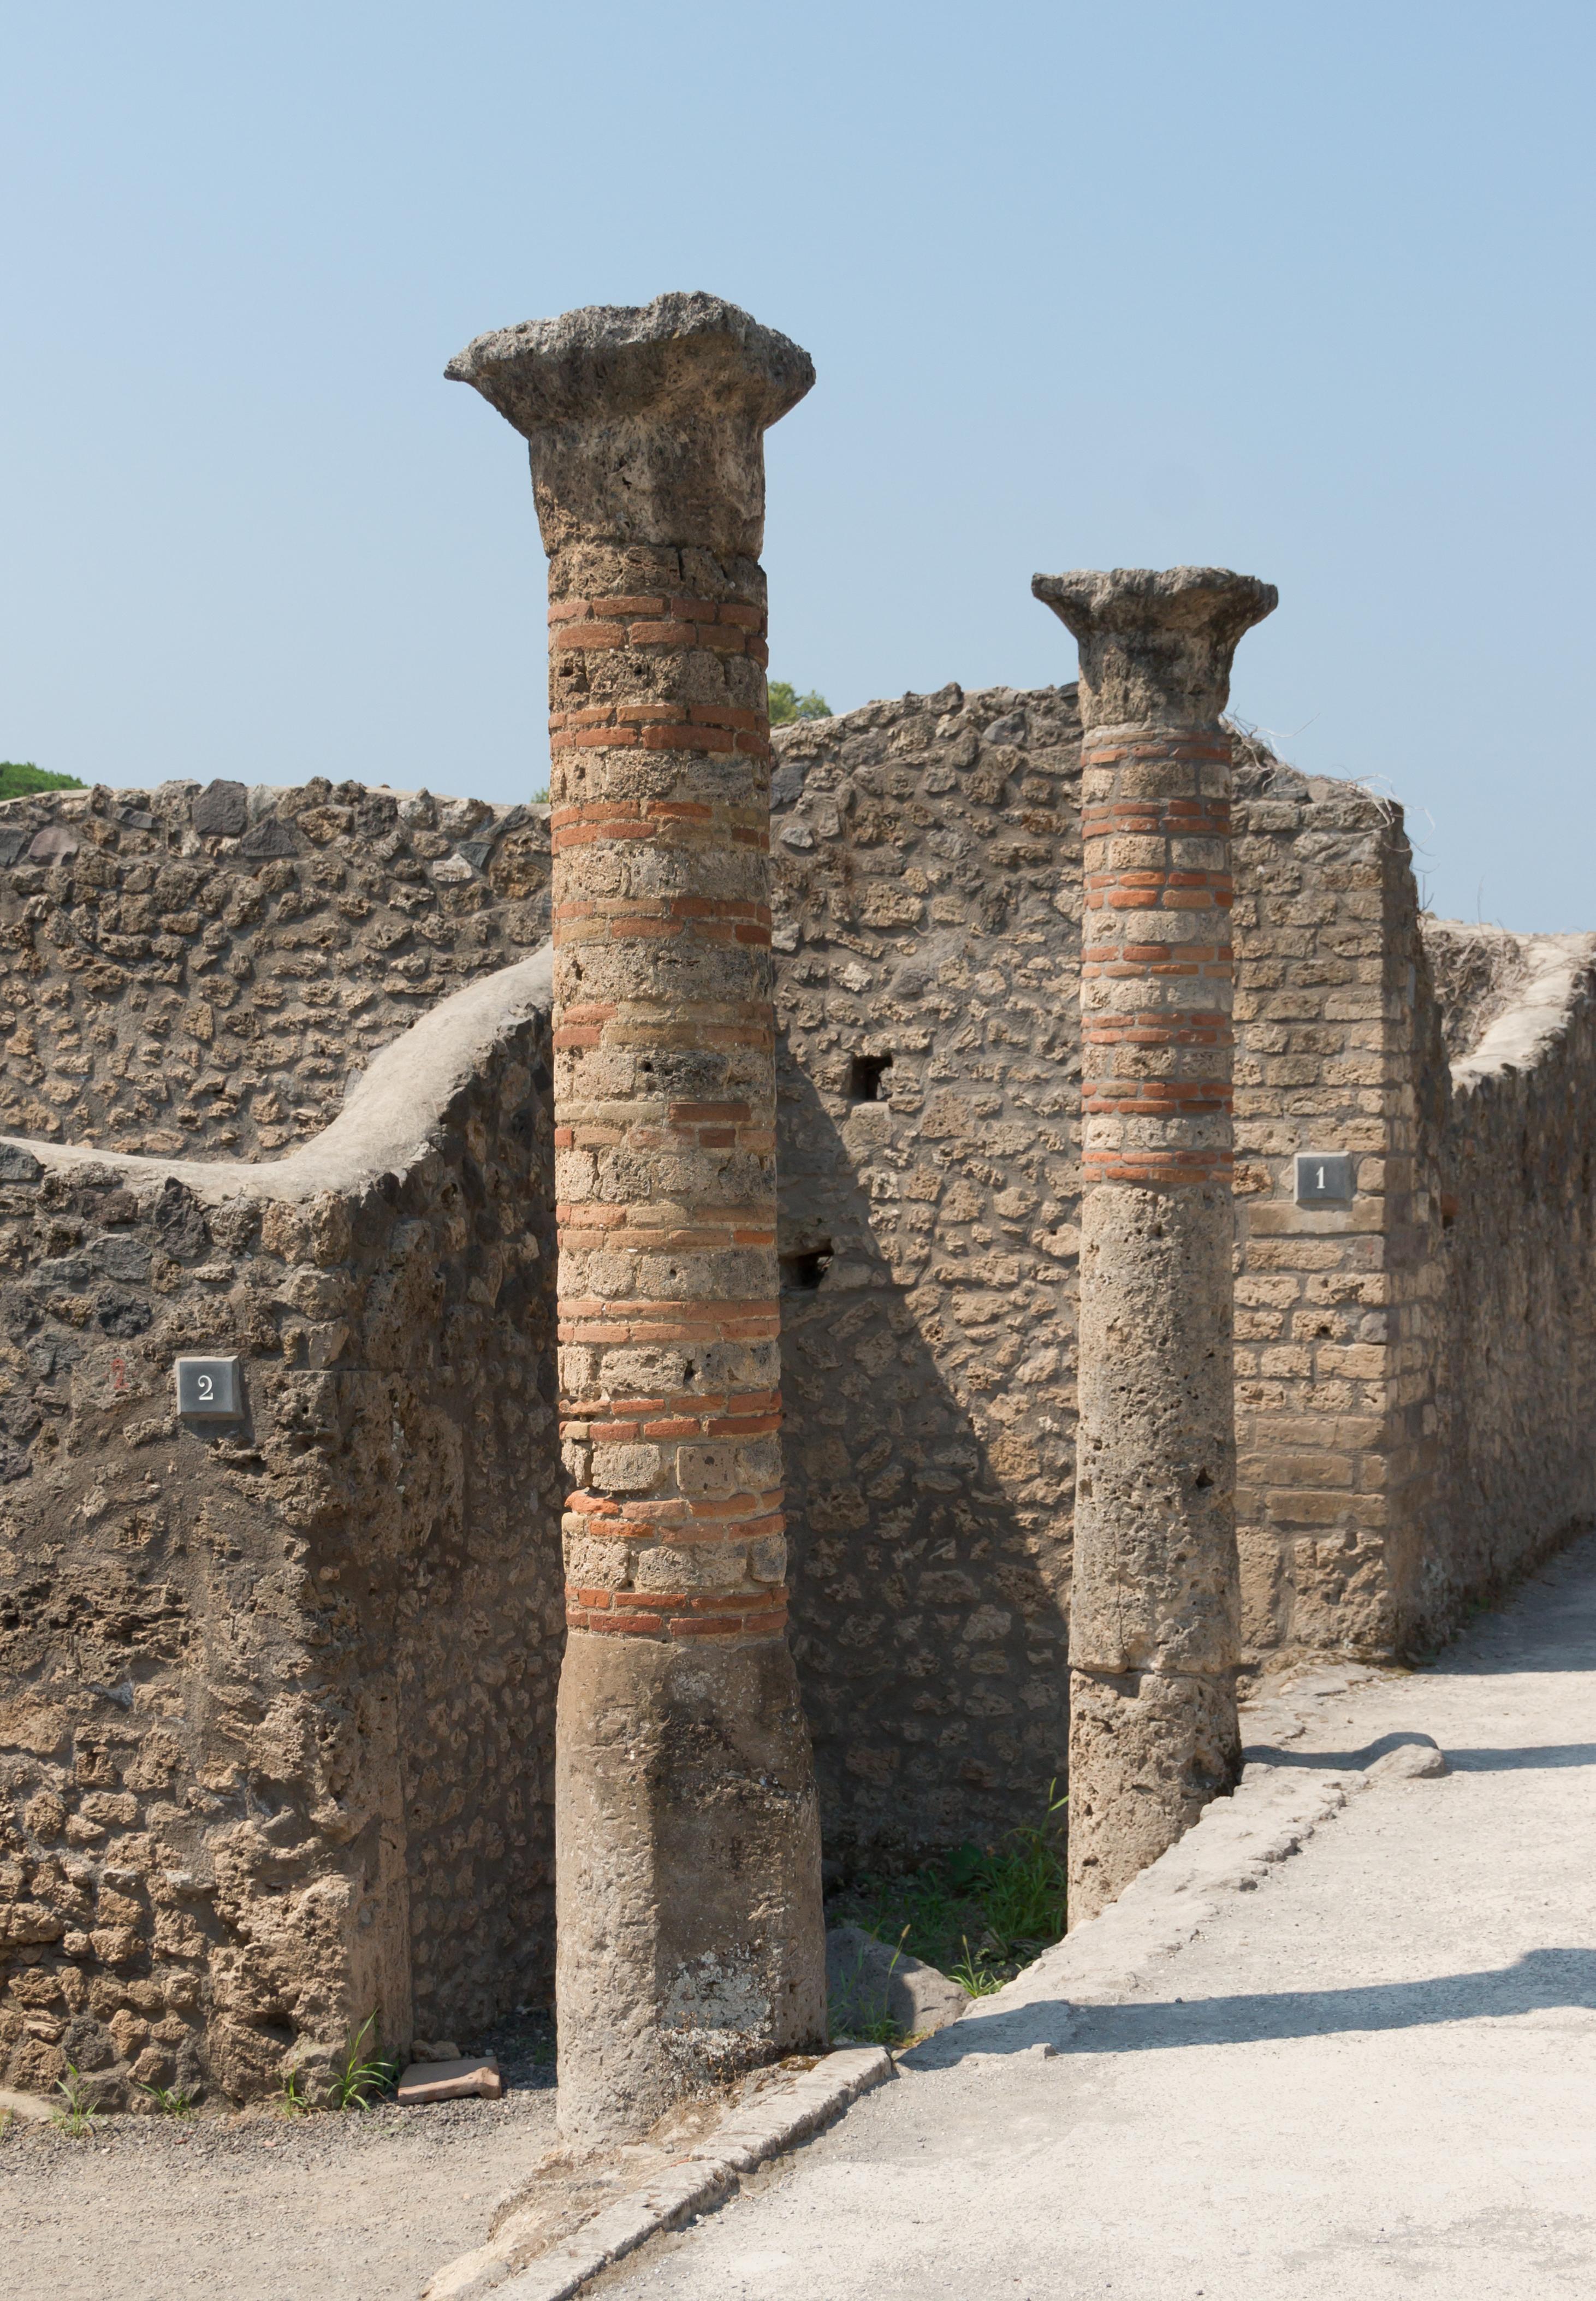 Brick And Stone Pillars : File stone brick columns in pompeii g wikimedia commons